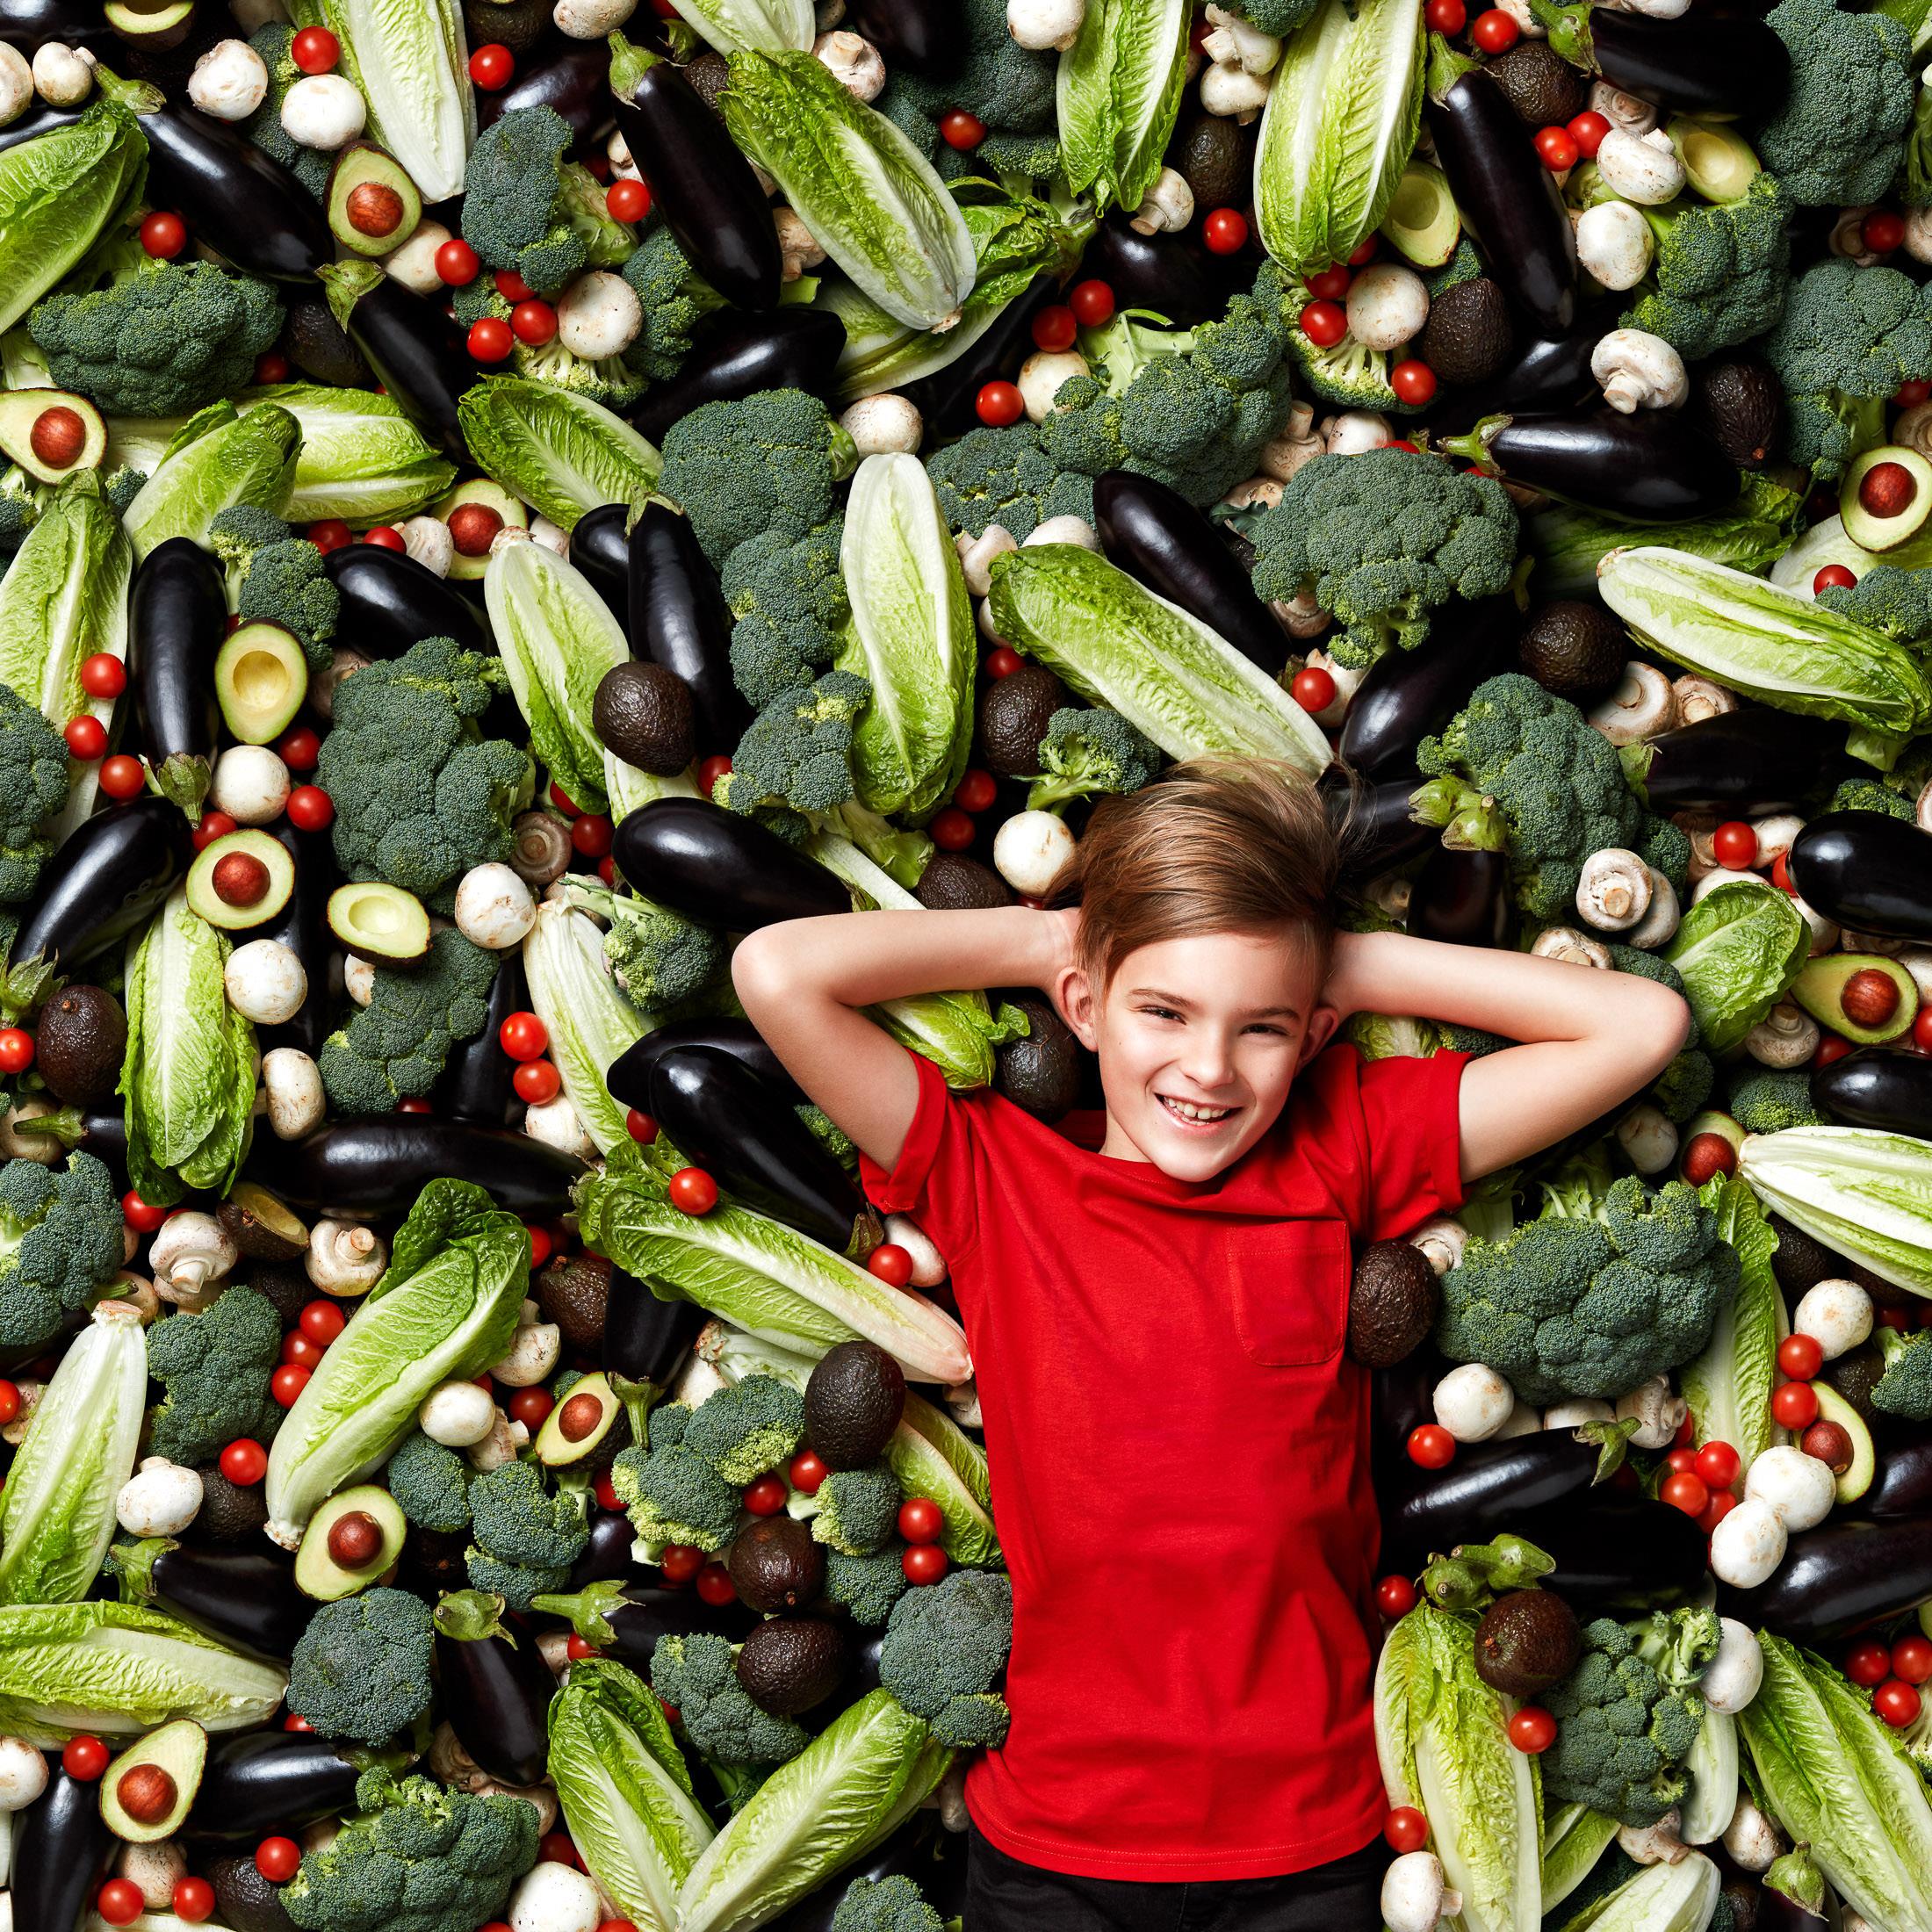 ICA Maxi – Vegetables